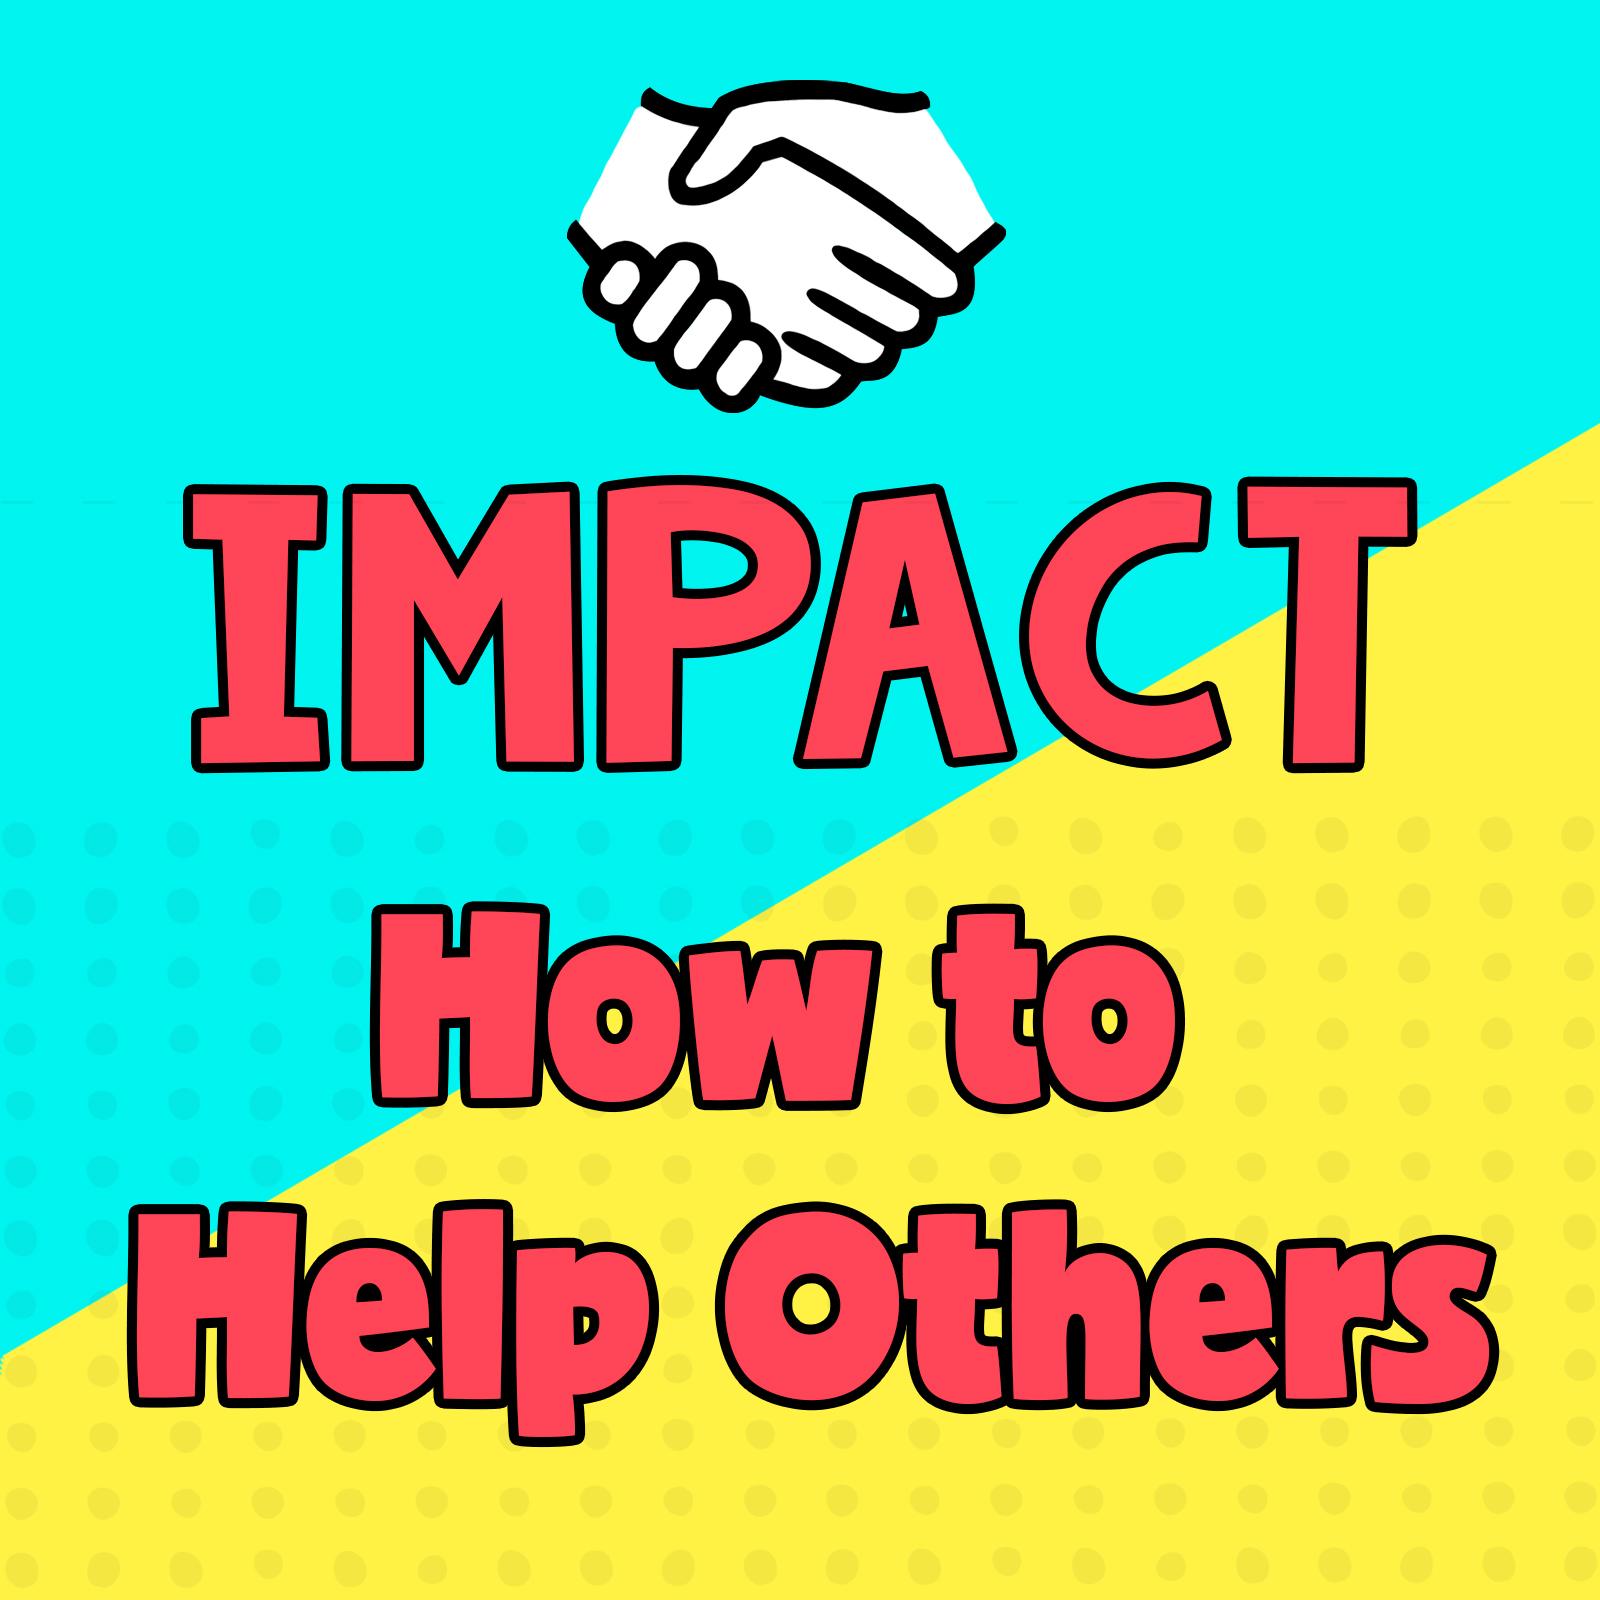 Volunteer how to help others